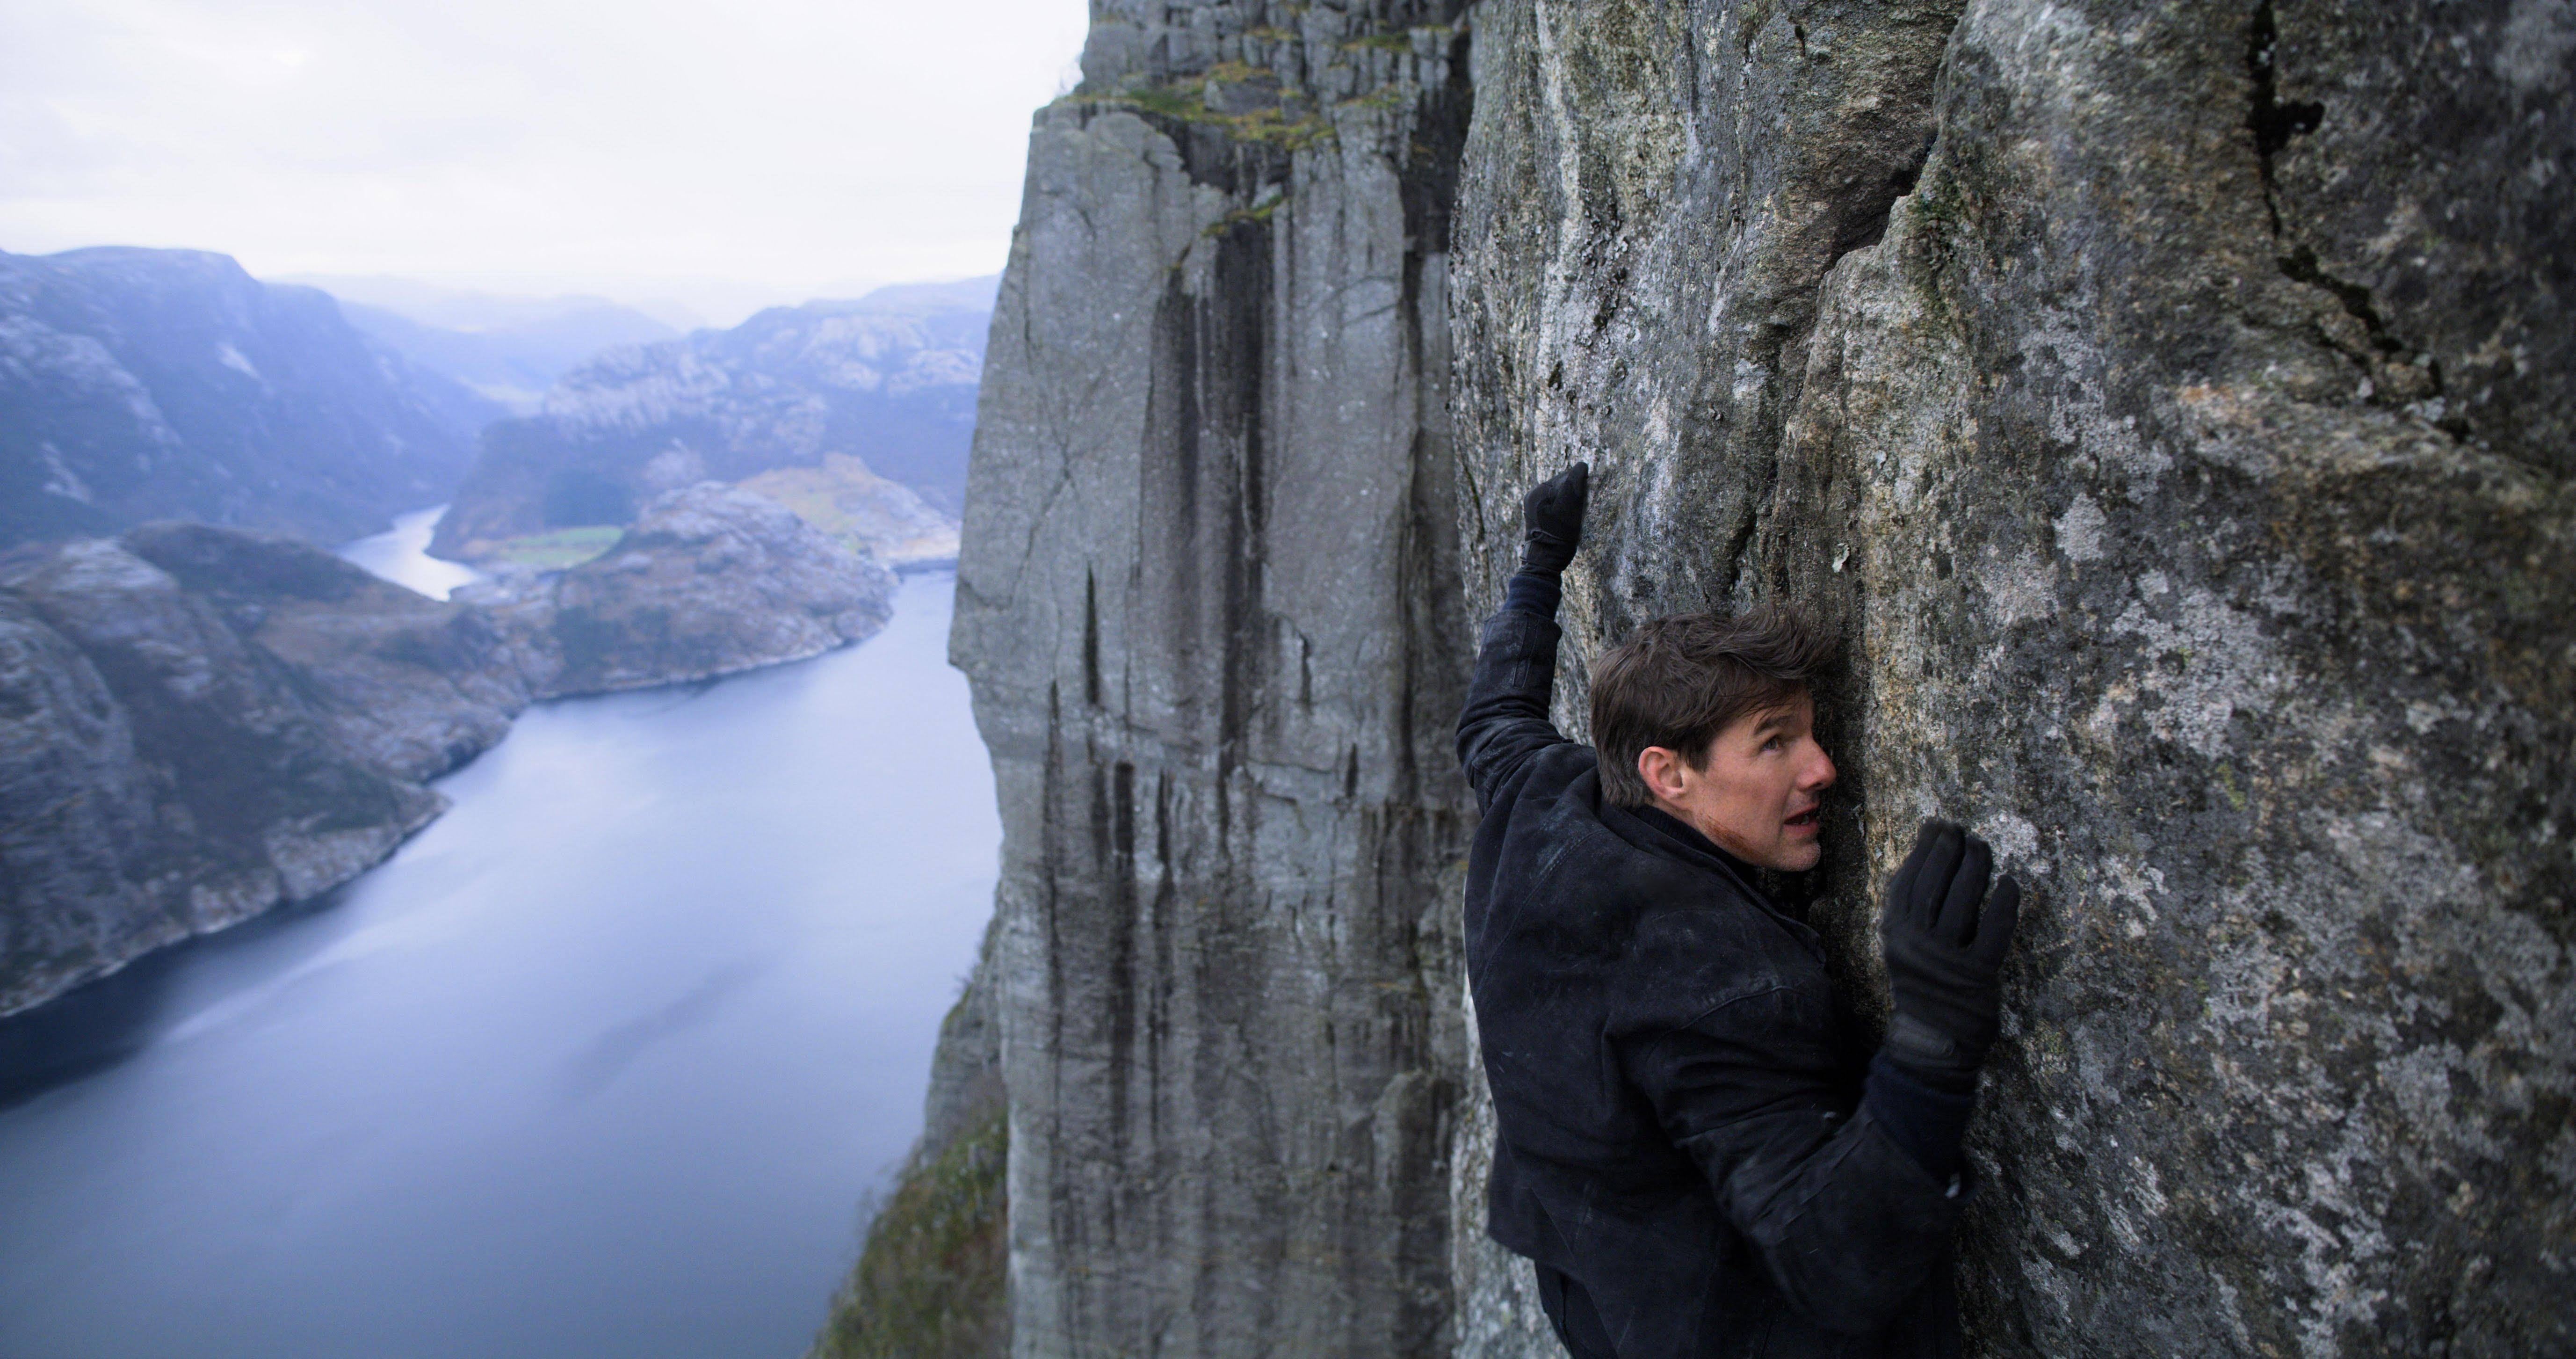 Mission Impossible : トム・クルーズ主演の人気スパイ・アクション映画シリーズの第6弾「ミッション : インポッシブル - フォールアウト」が、スーパーボウル・スポットと一緒に予告編を初公開 ! !